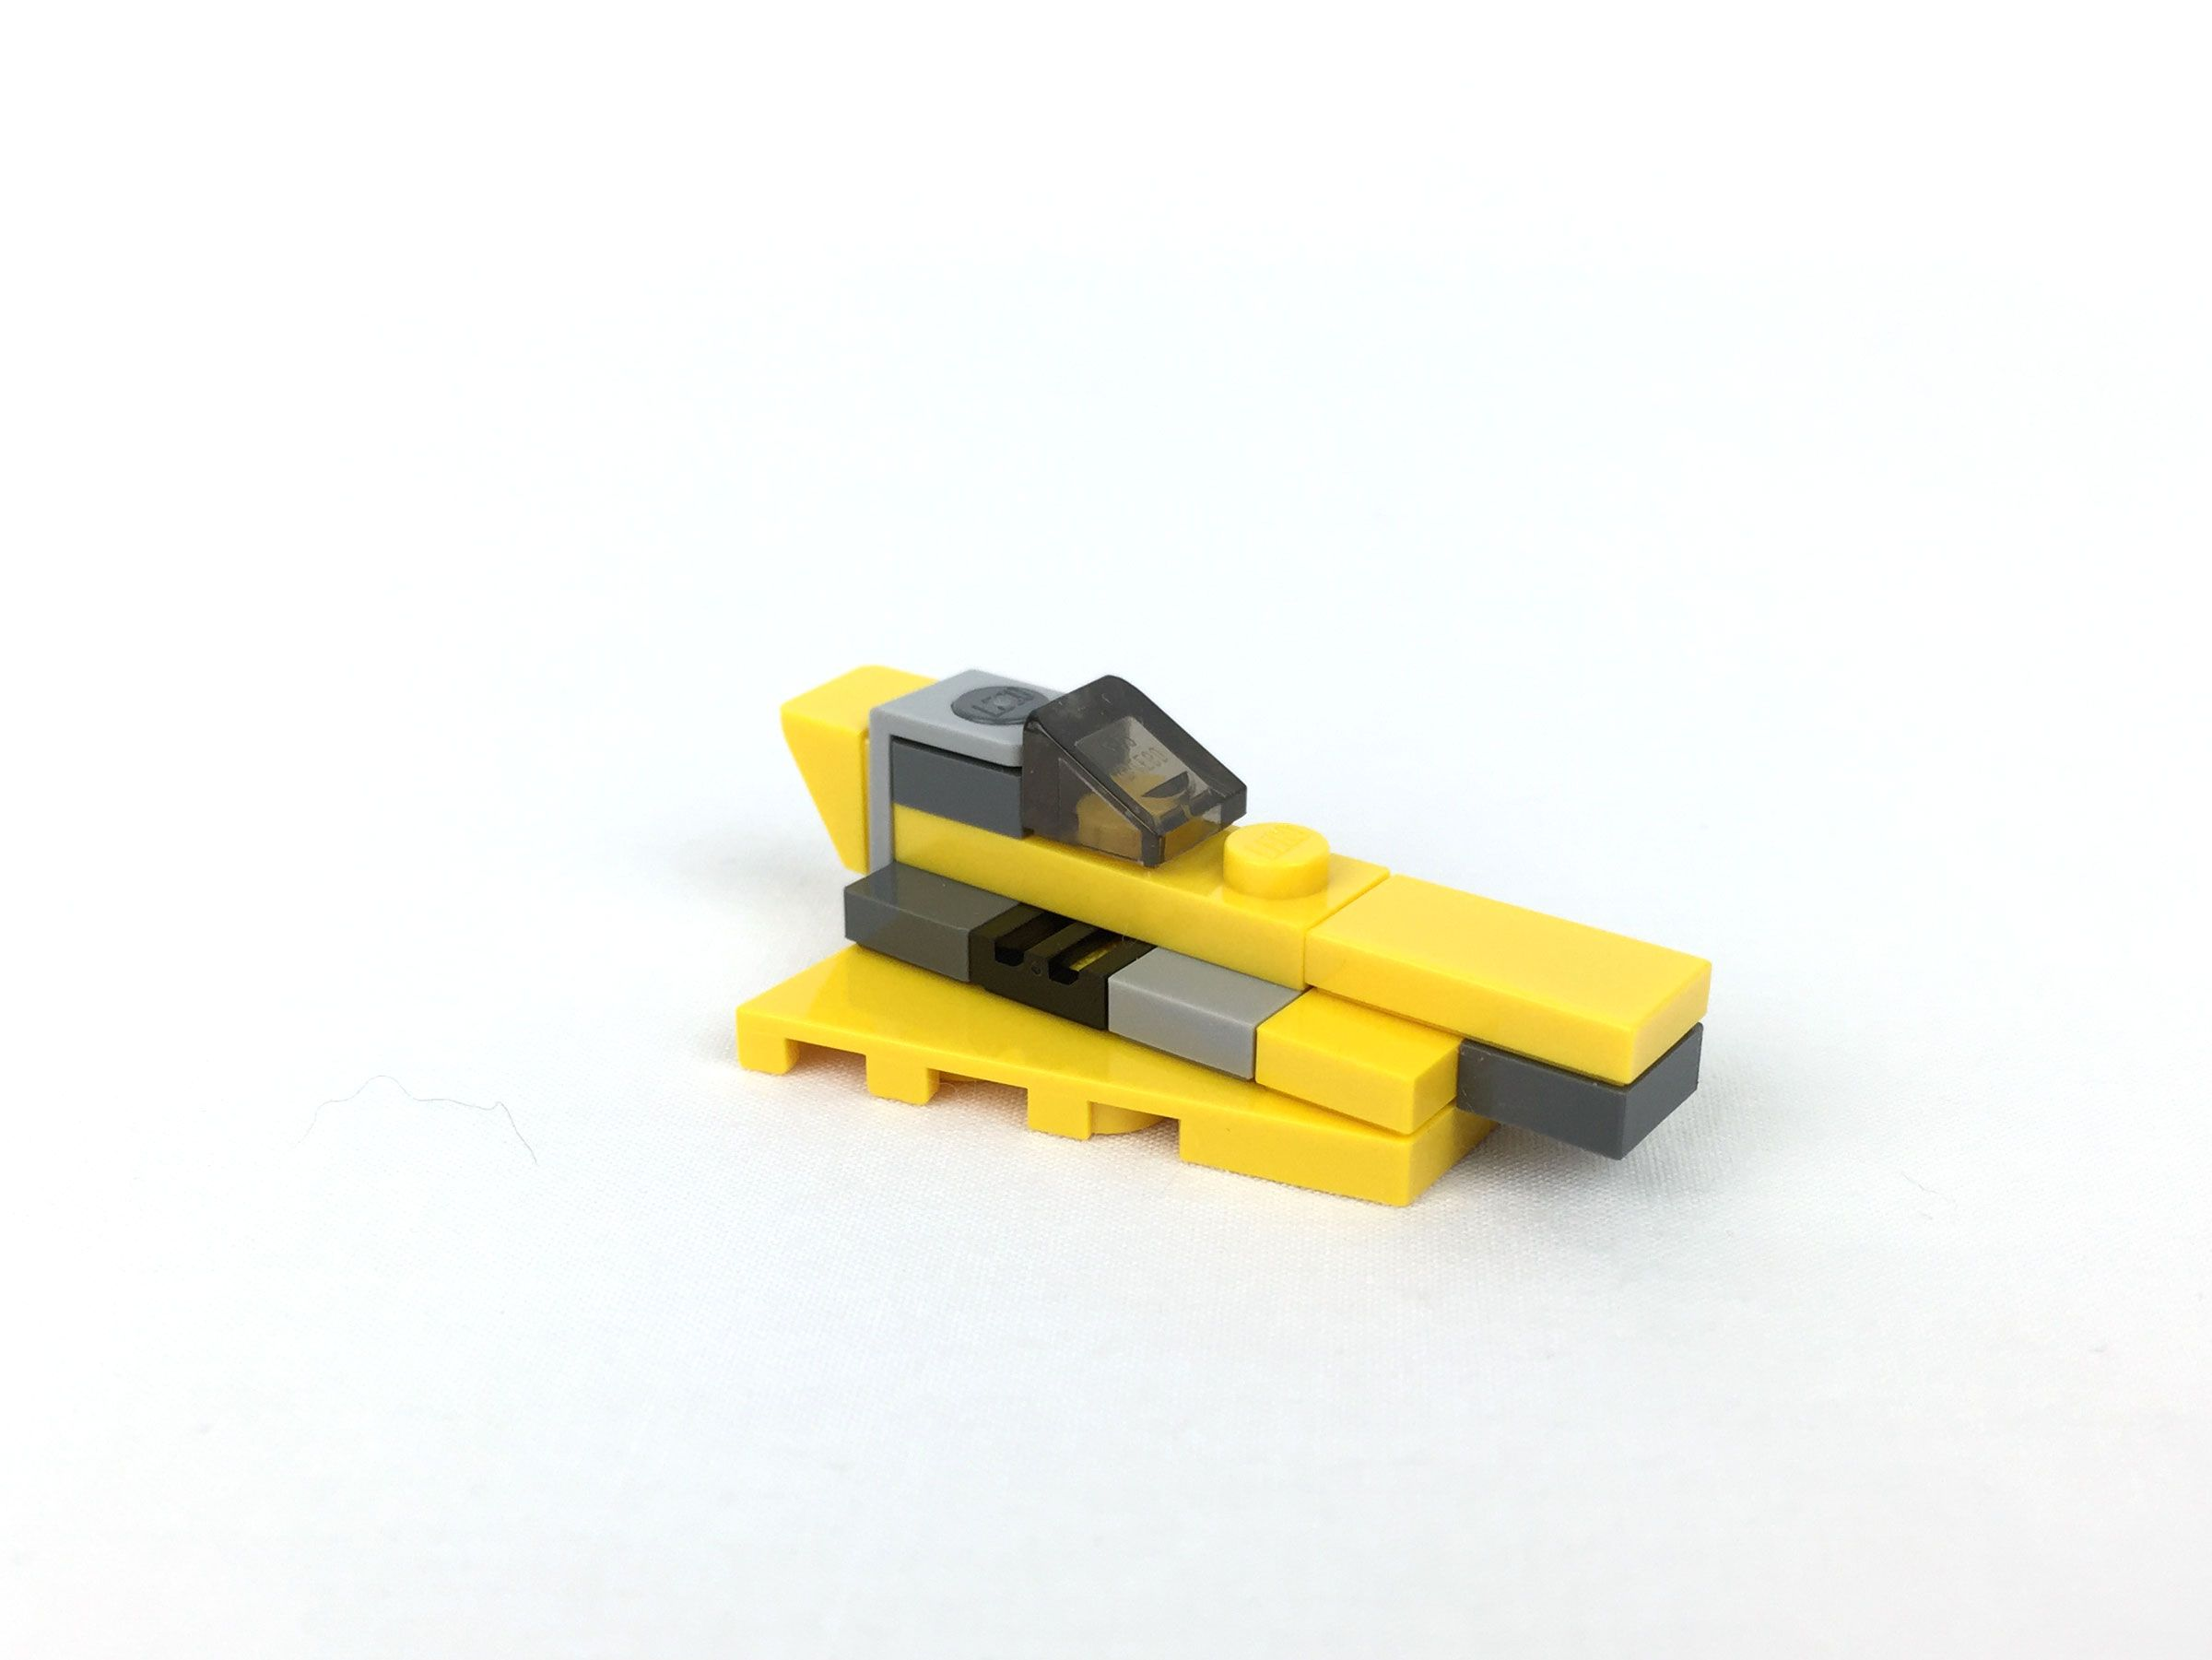 Mini ship | Lego Star Wars | Pinterest | Lego, Lego ...